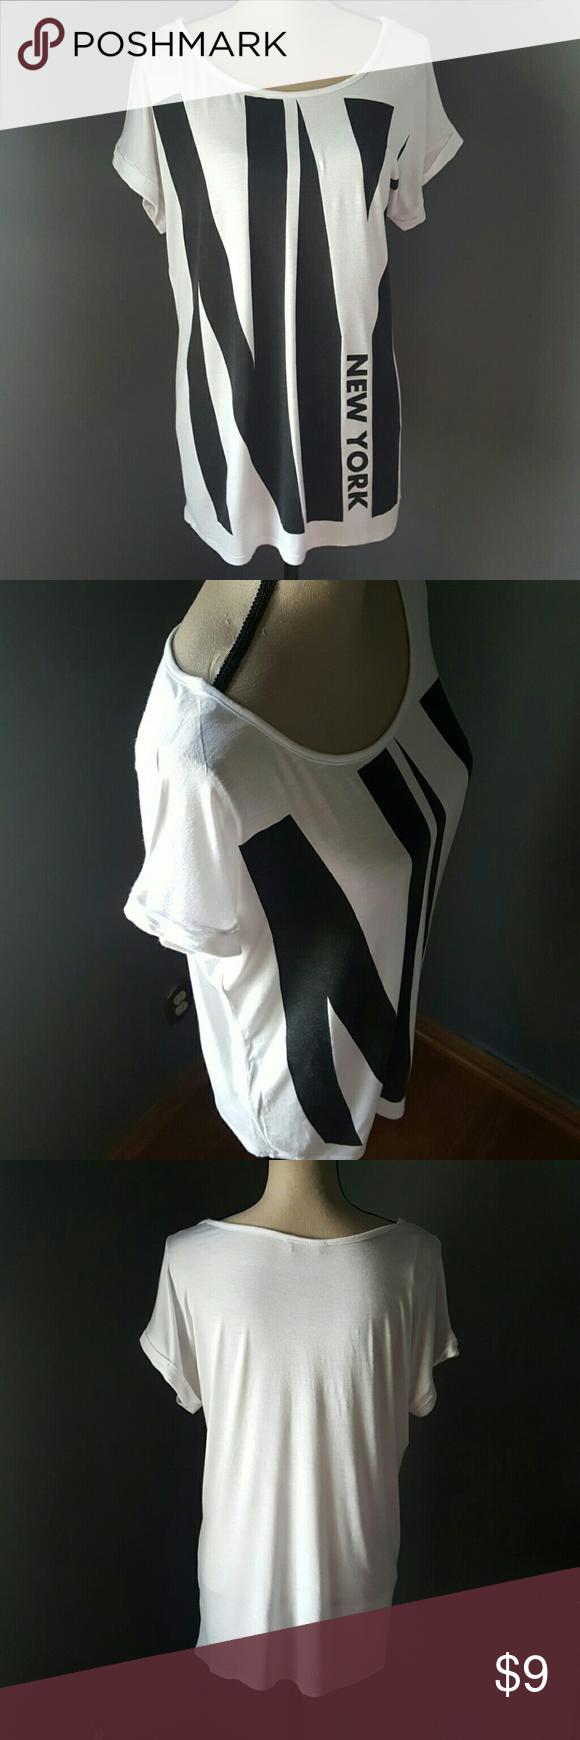 Statement Tshirt Women's New York graphic statement tshirt. Deb Tops Tees - Short Sleeve